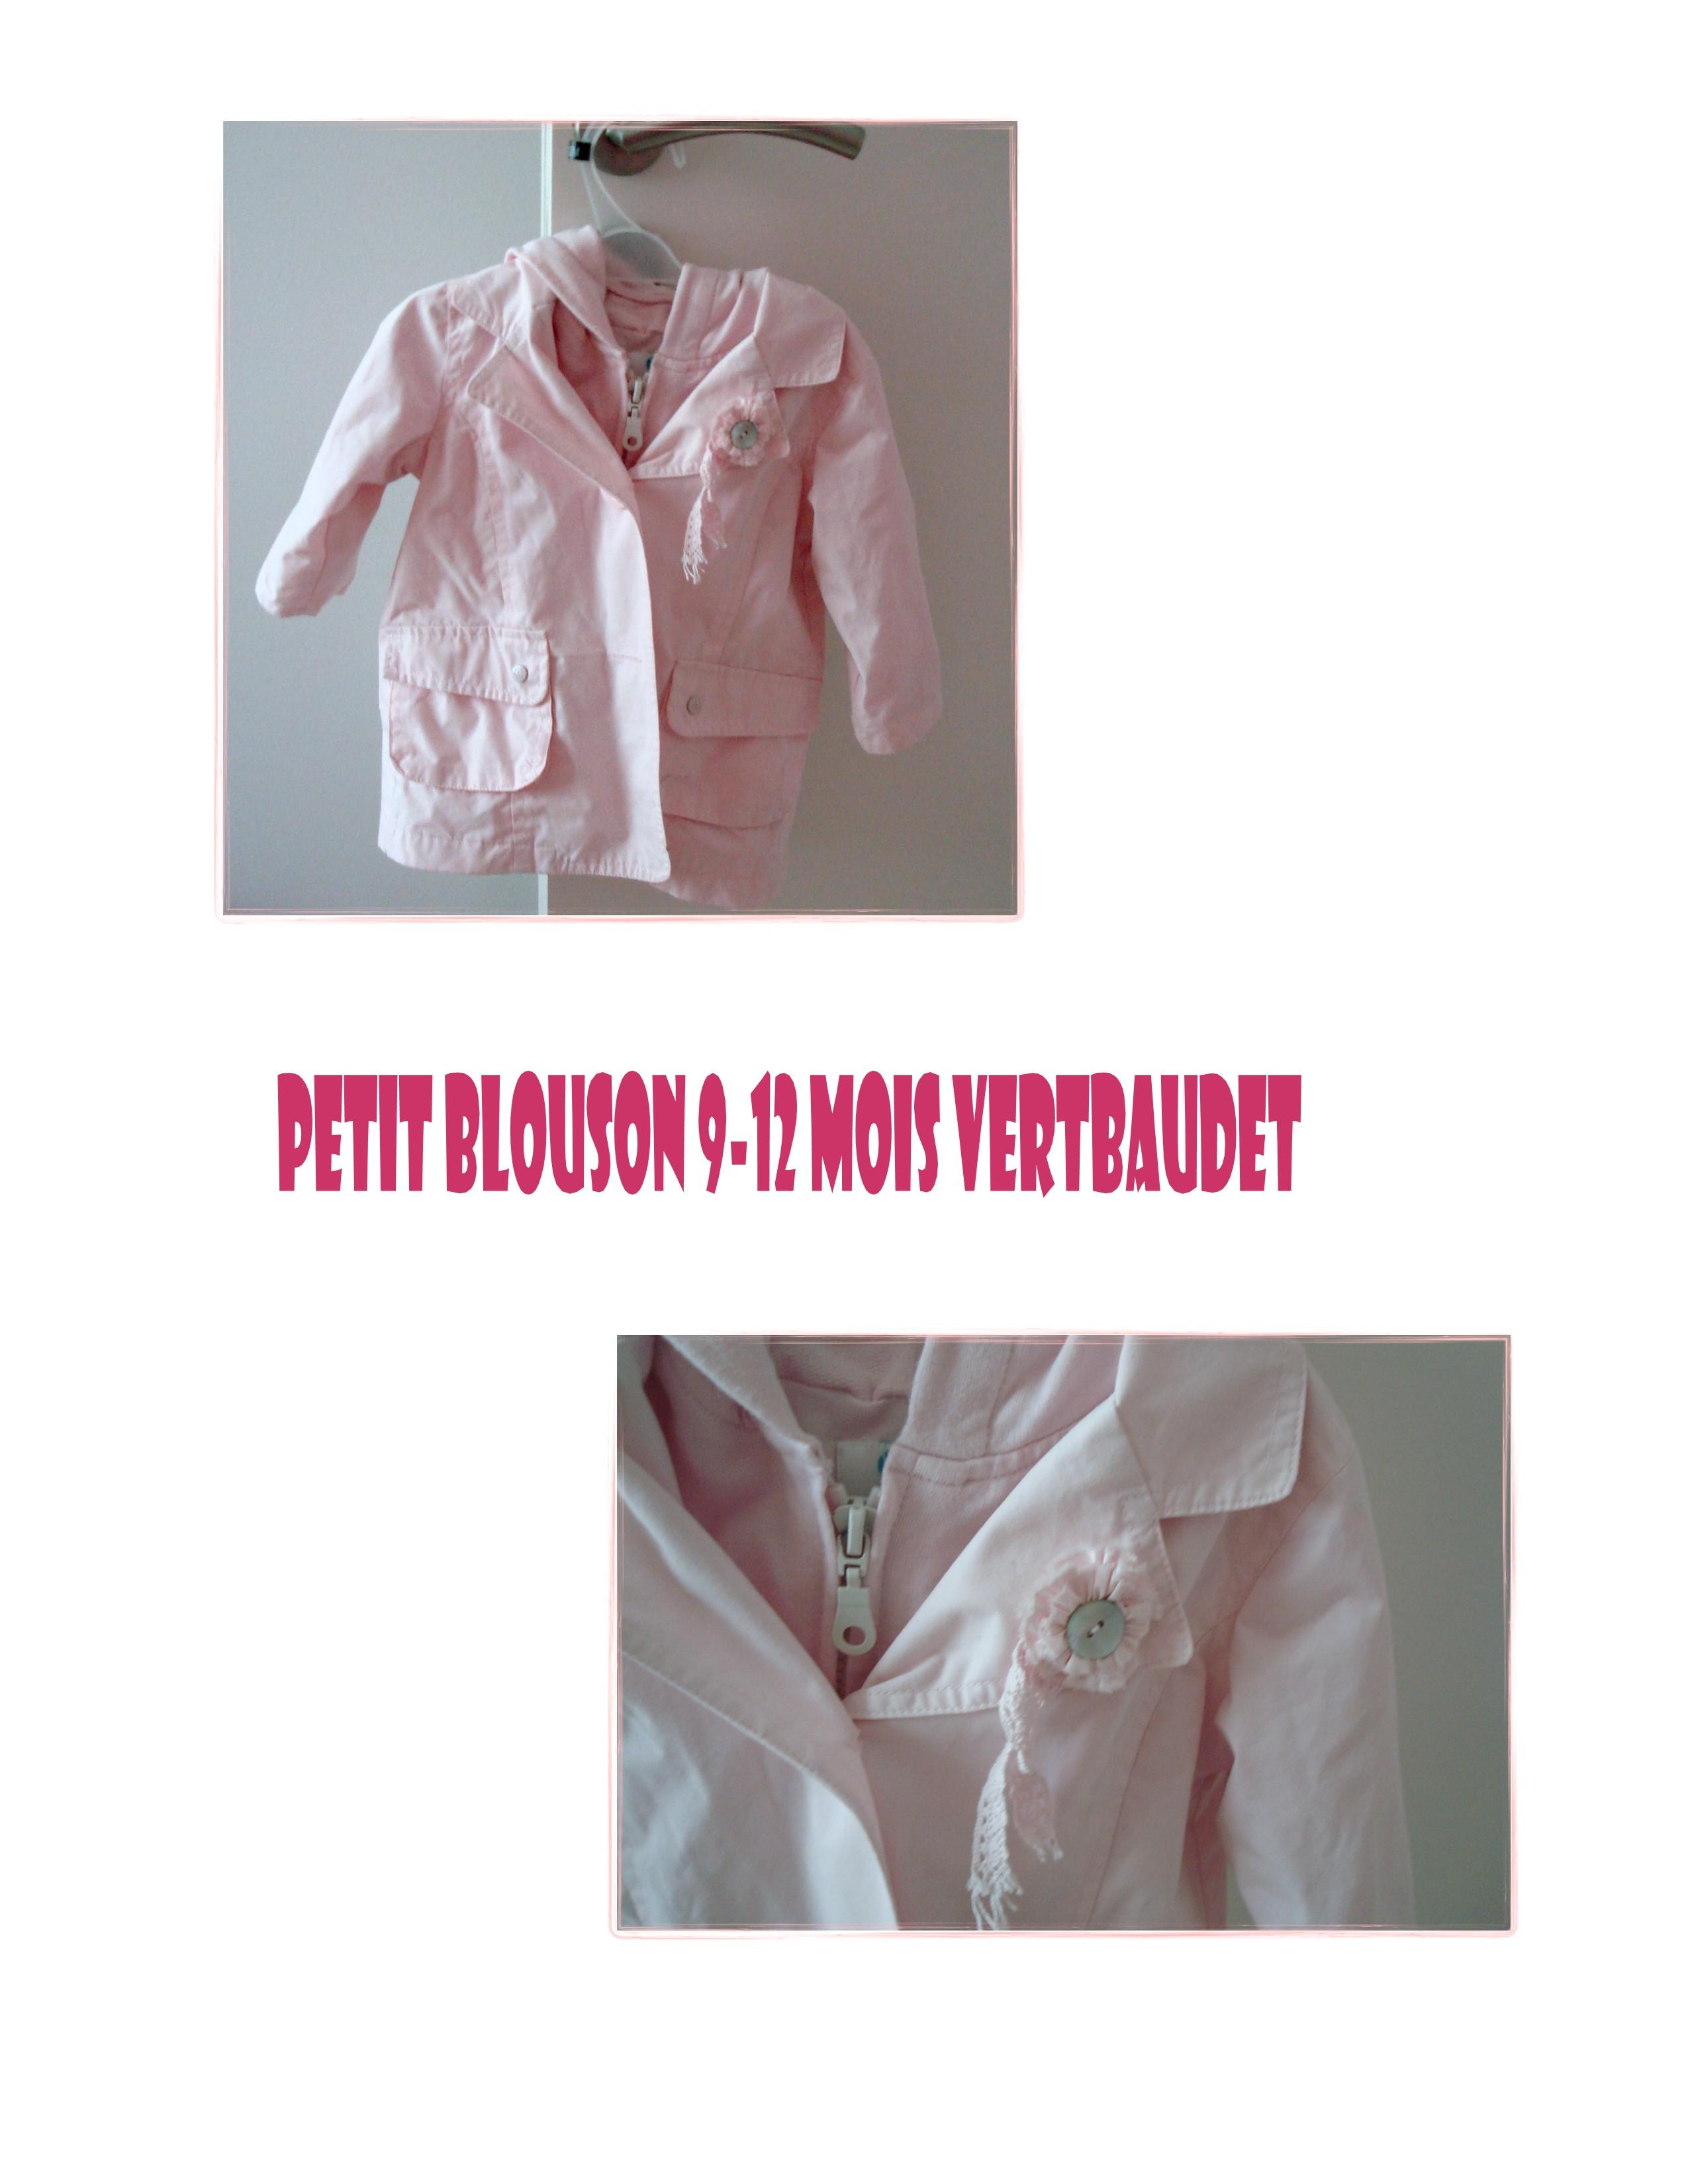 50 S foulard rose dame blanche Caniche CRAVATE Day Wear Accessoire ou graisse Dress Up